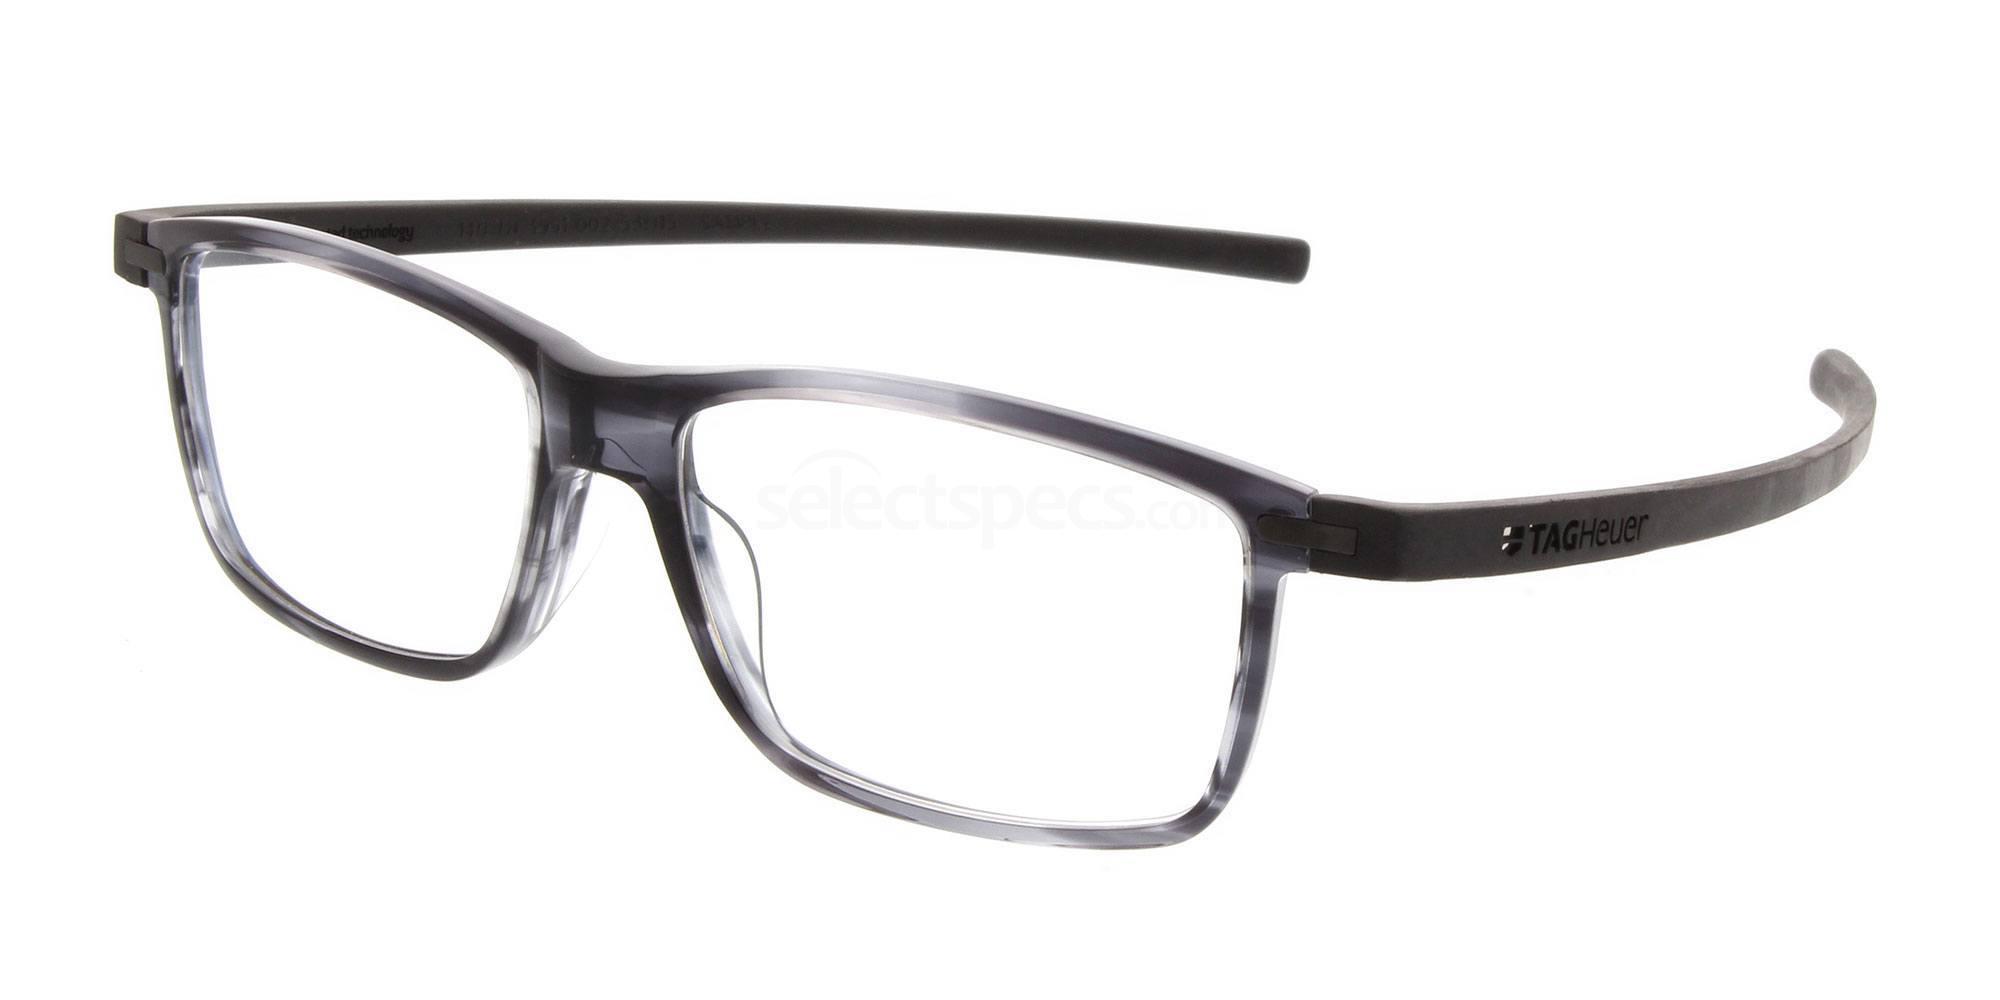 002 Reflex 3 Acetate 3951 Glasses, TAG Heuer